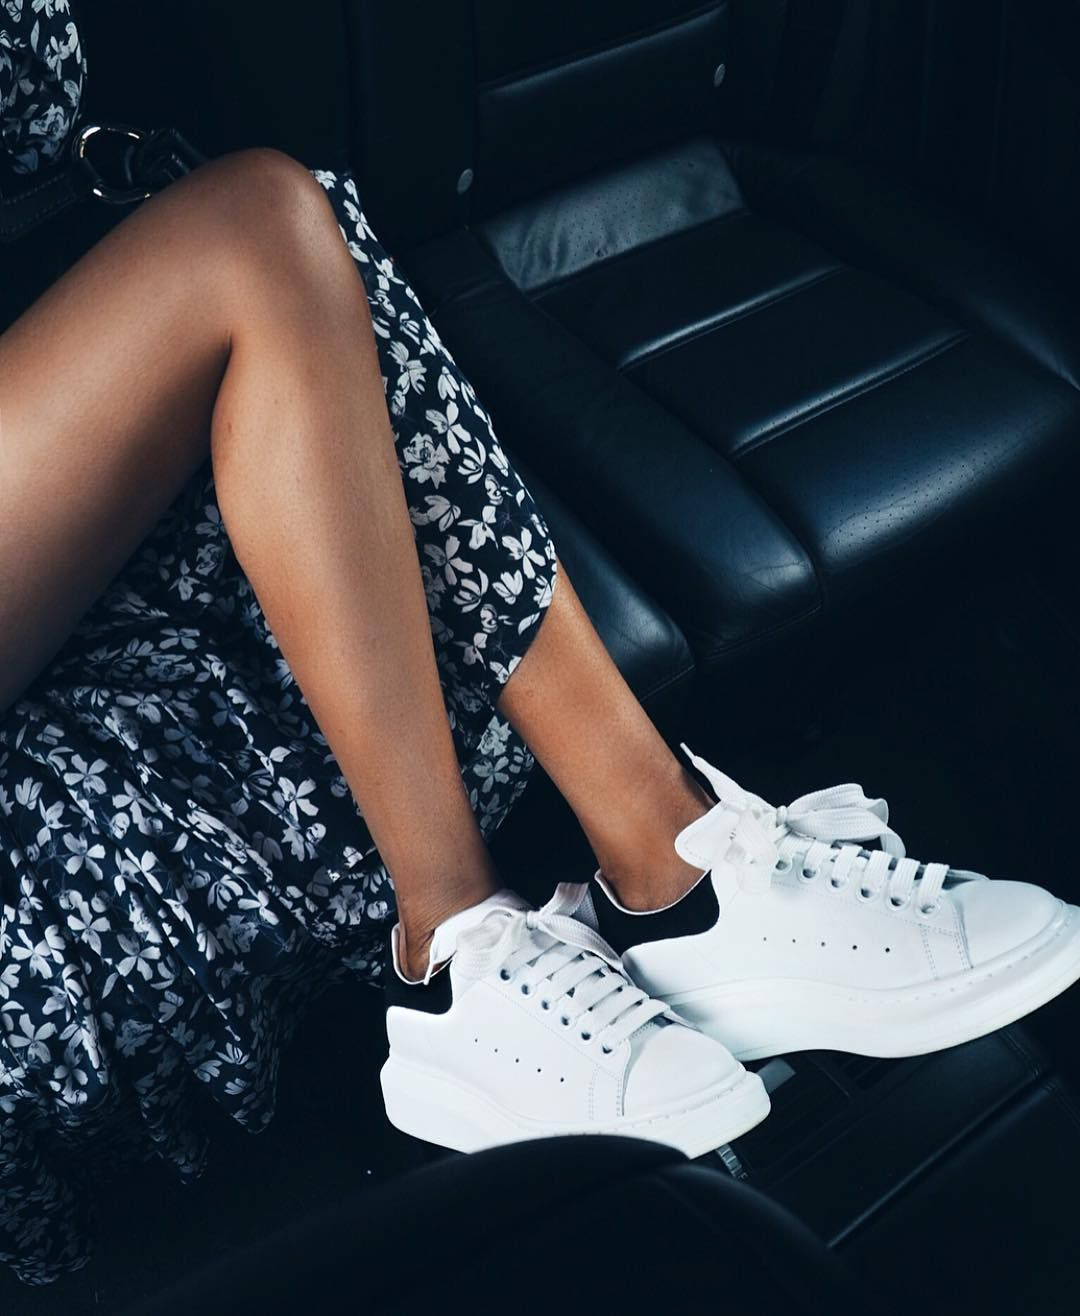 d966981970913 Tenues Mode, Idee Tenue, Mode Tendance, Chaussure, Mode Monochrome,  Chaussures De